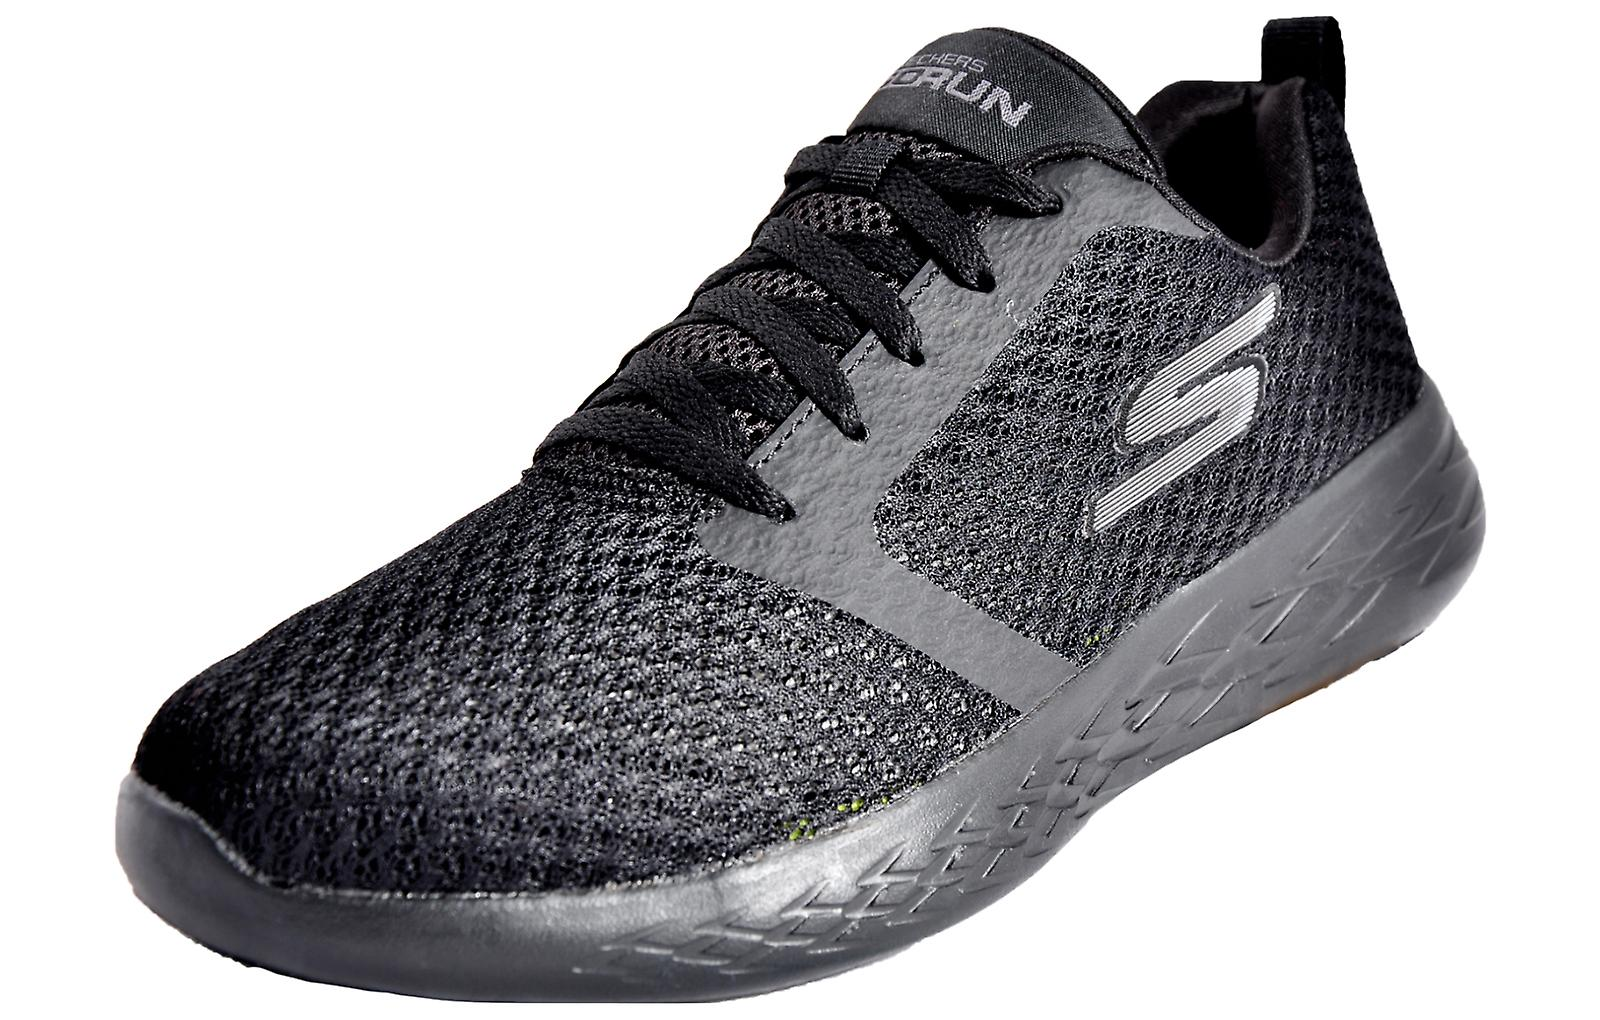 Skechers Go Run 600 Comfort Foam Black